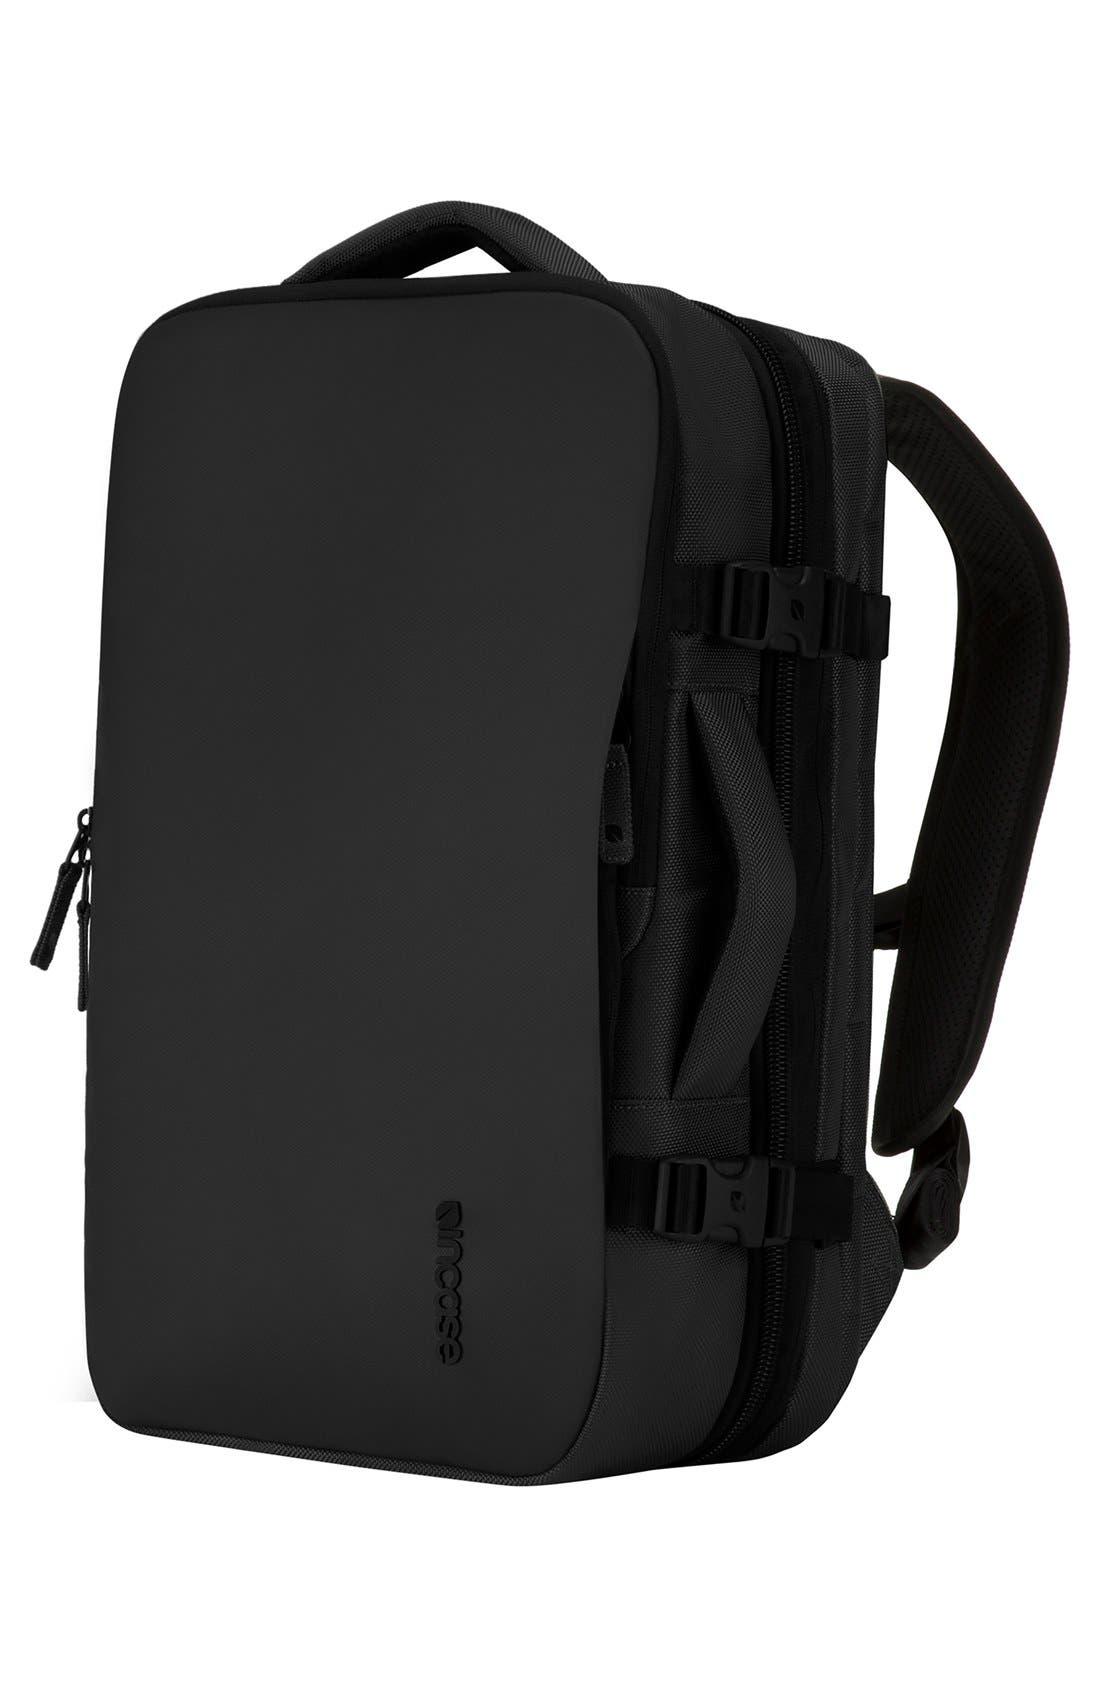 VIA Backpack,                             Alternate thumbnail 3, color,                             001